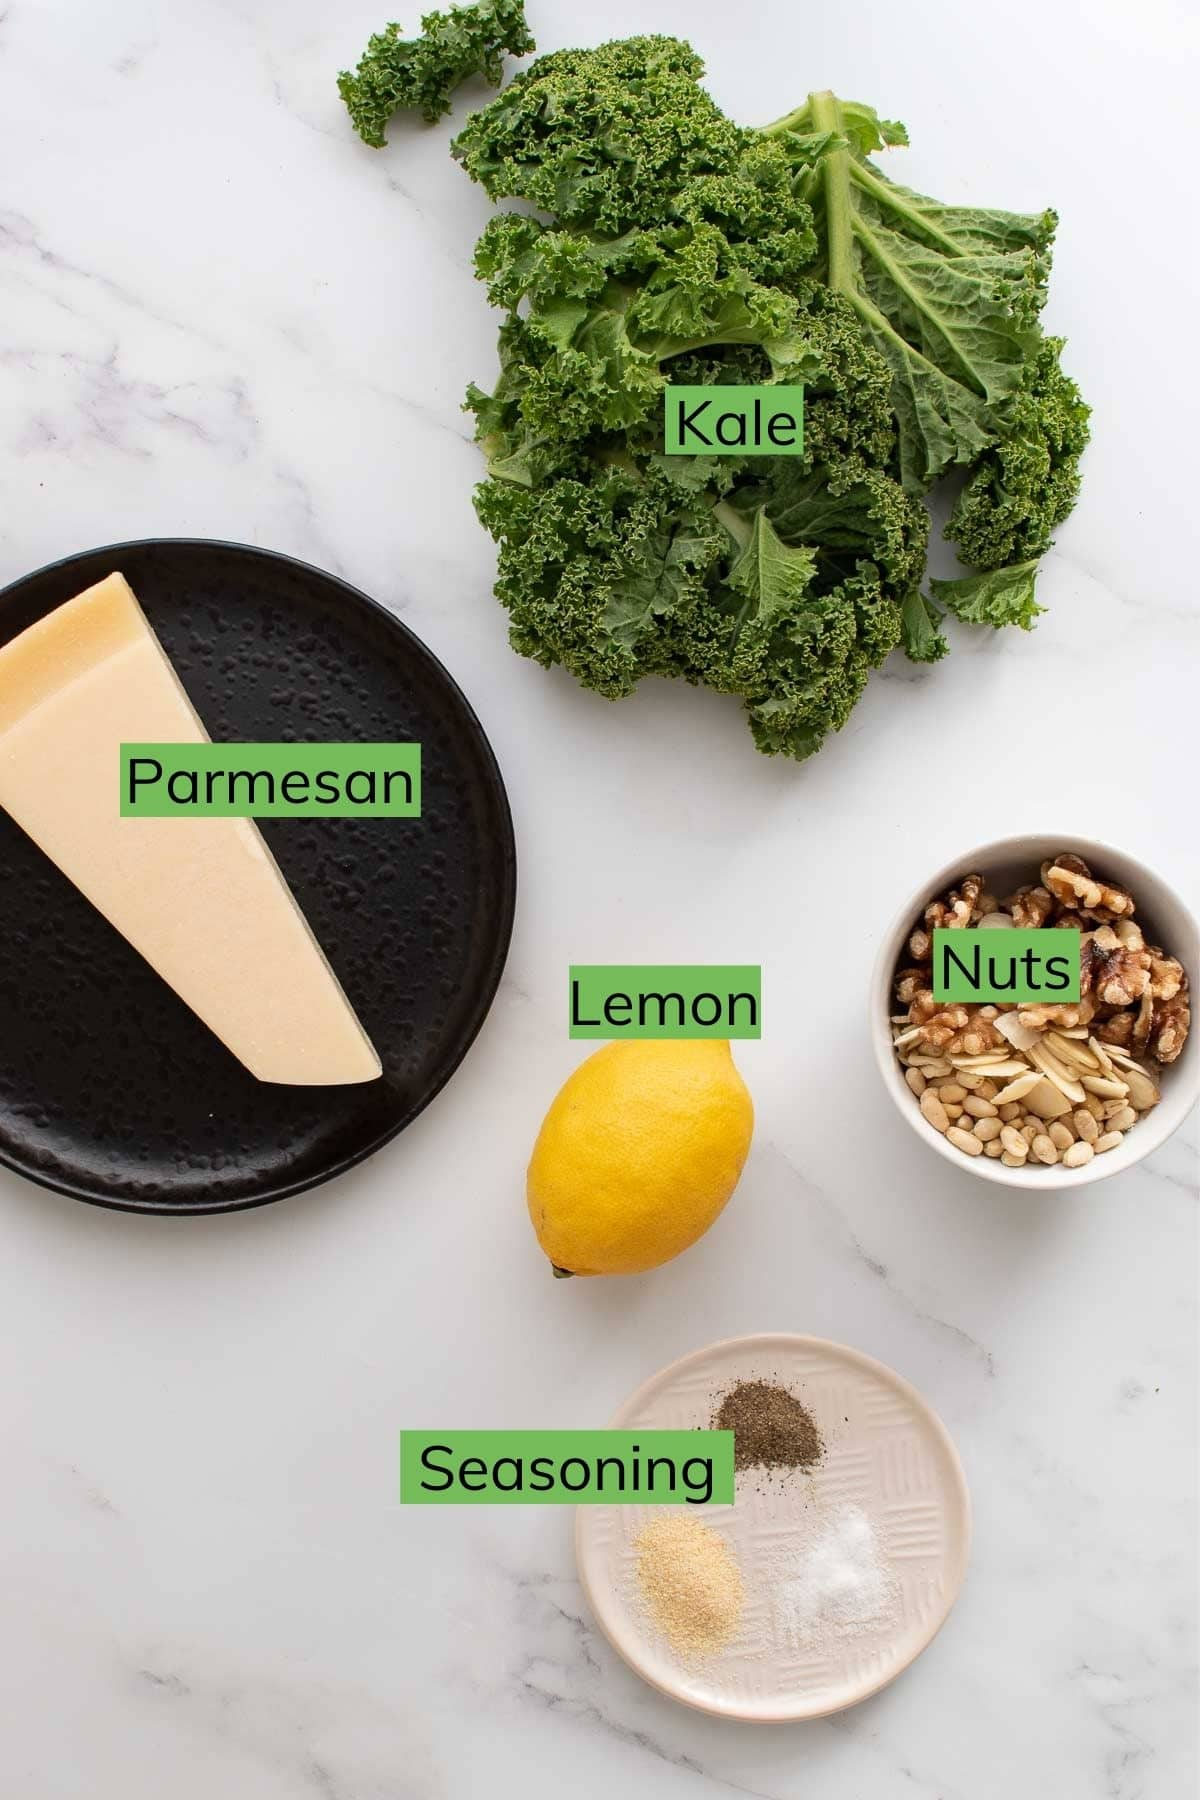 Ingredients needed to make lemon kale salad.